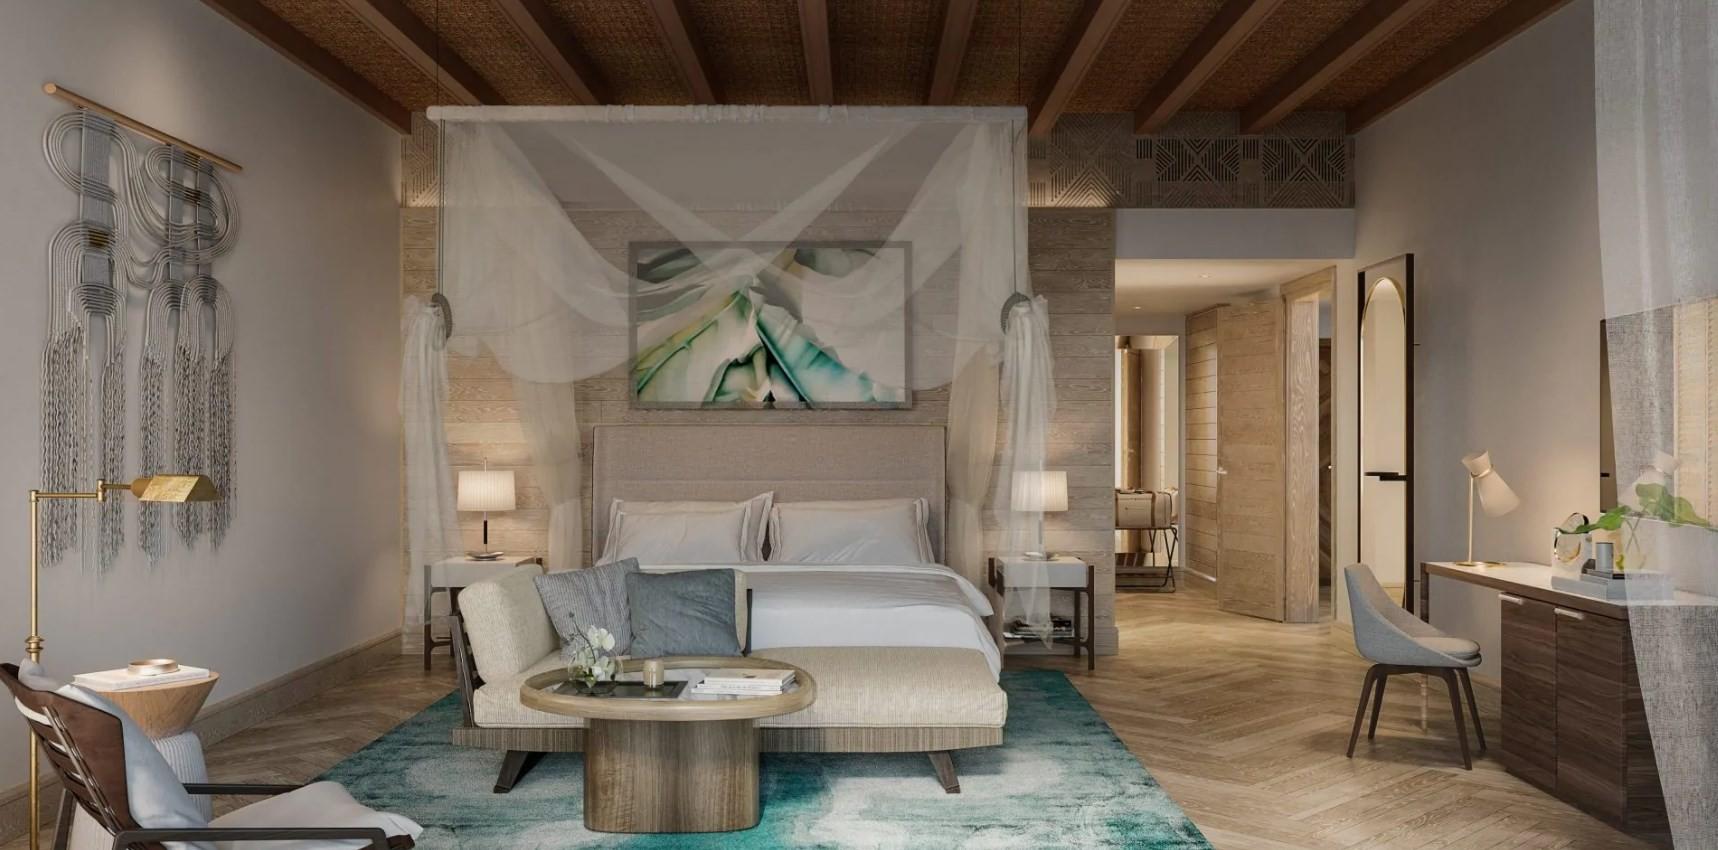 news-main-sasha-tyas-named-general-manager-for-the-mango-house-seychelles-lxr-hotels-resorts.1620736963.jpg